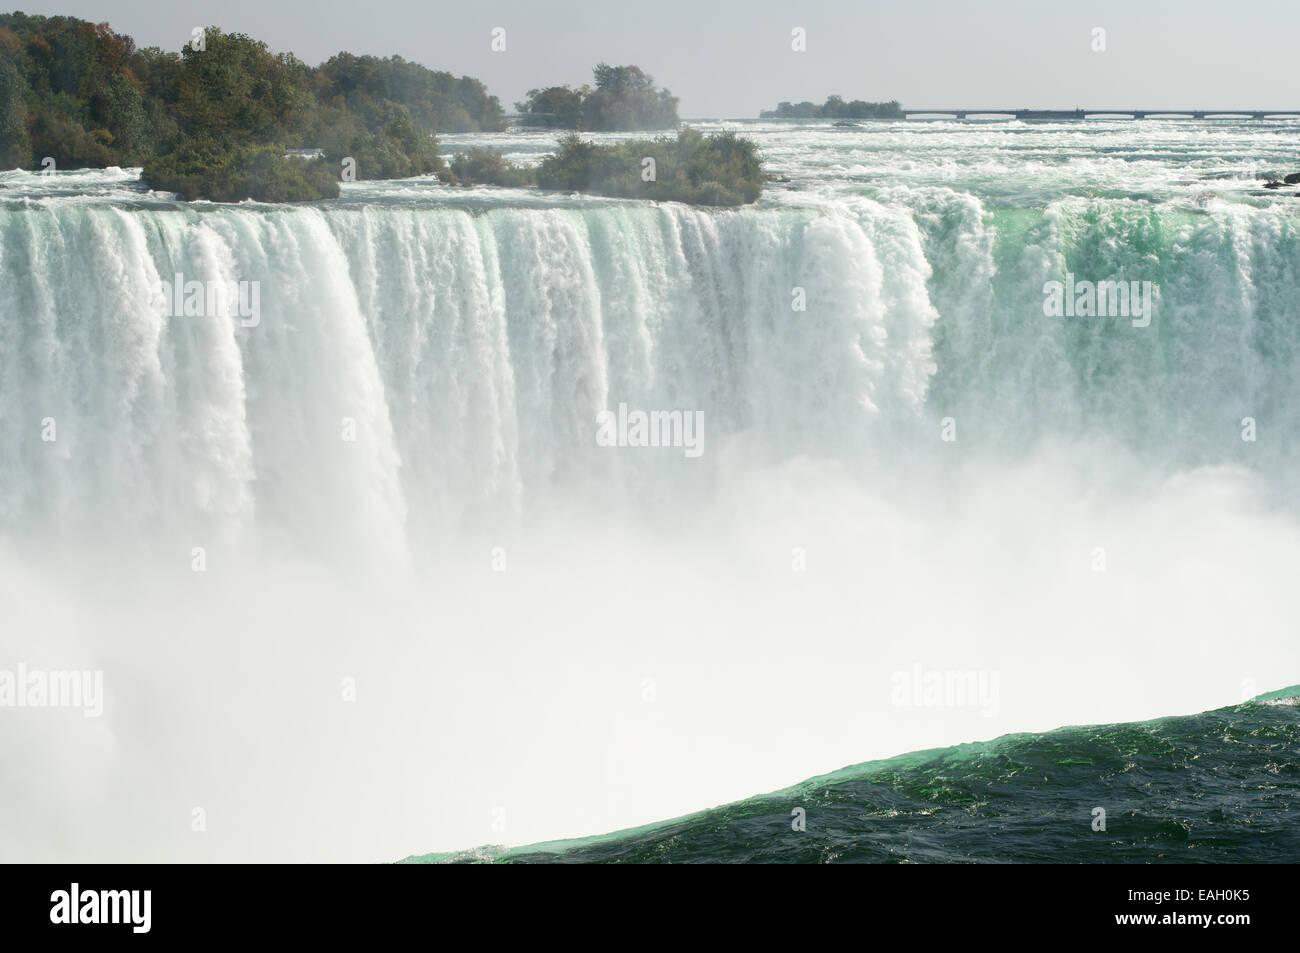 Horseshoe falls, Niagara Falls seen from the top Ontario, Canada - Stock Image